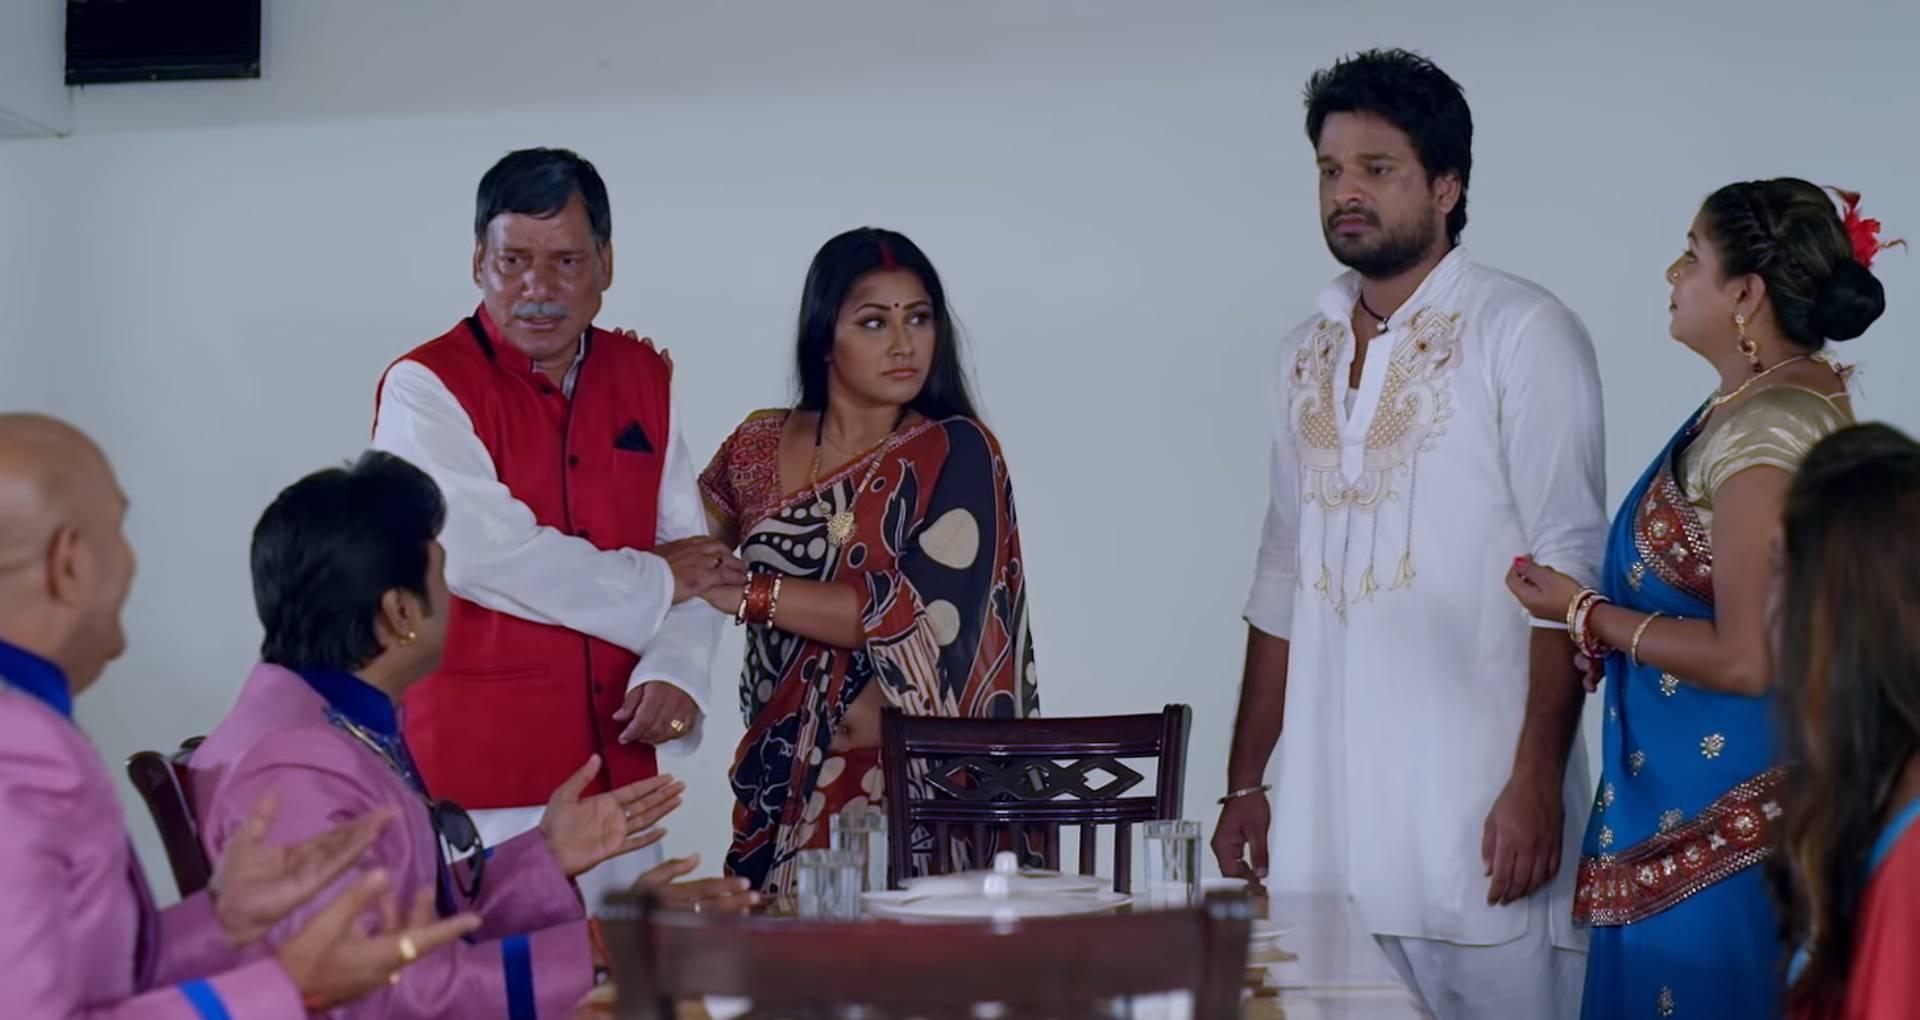 रितेश पांडे की फिल्म नाचे नागिन गली गली ने यूट्यूब पर मचाया धमाल, इतने कम समय में मिले 1 करोड़ से ज्यादा व्यूज